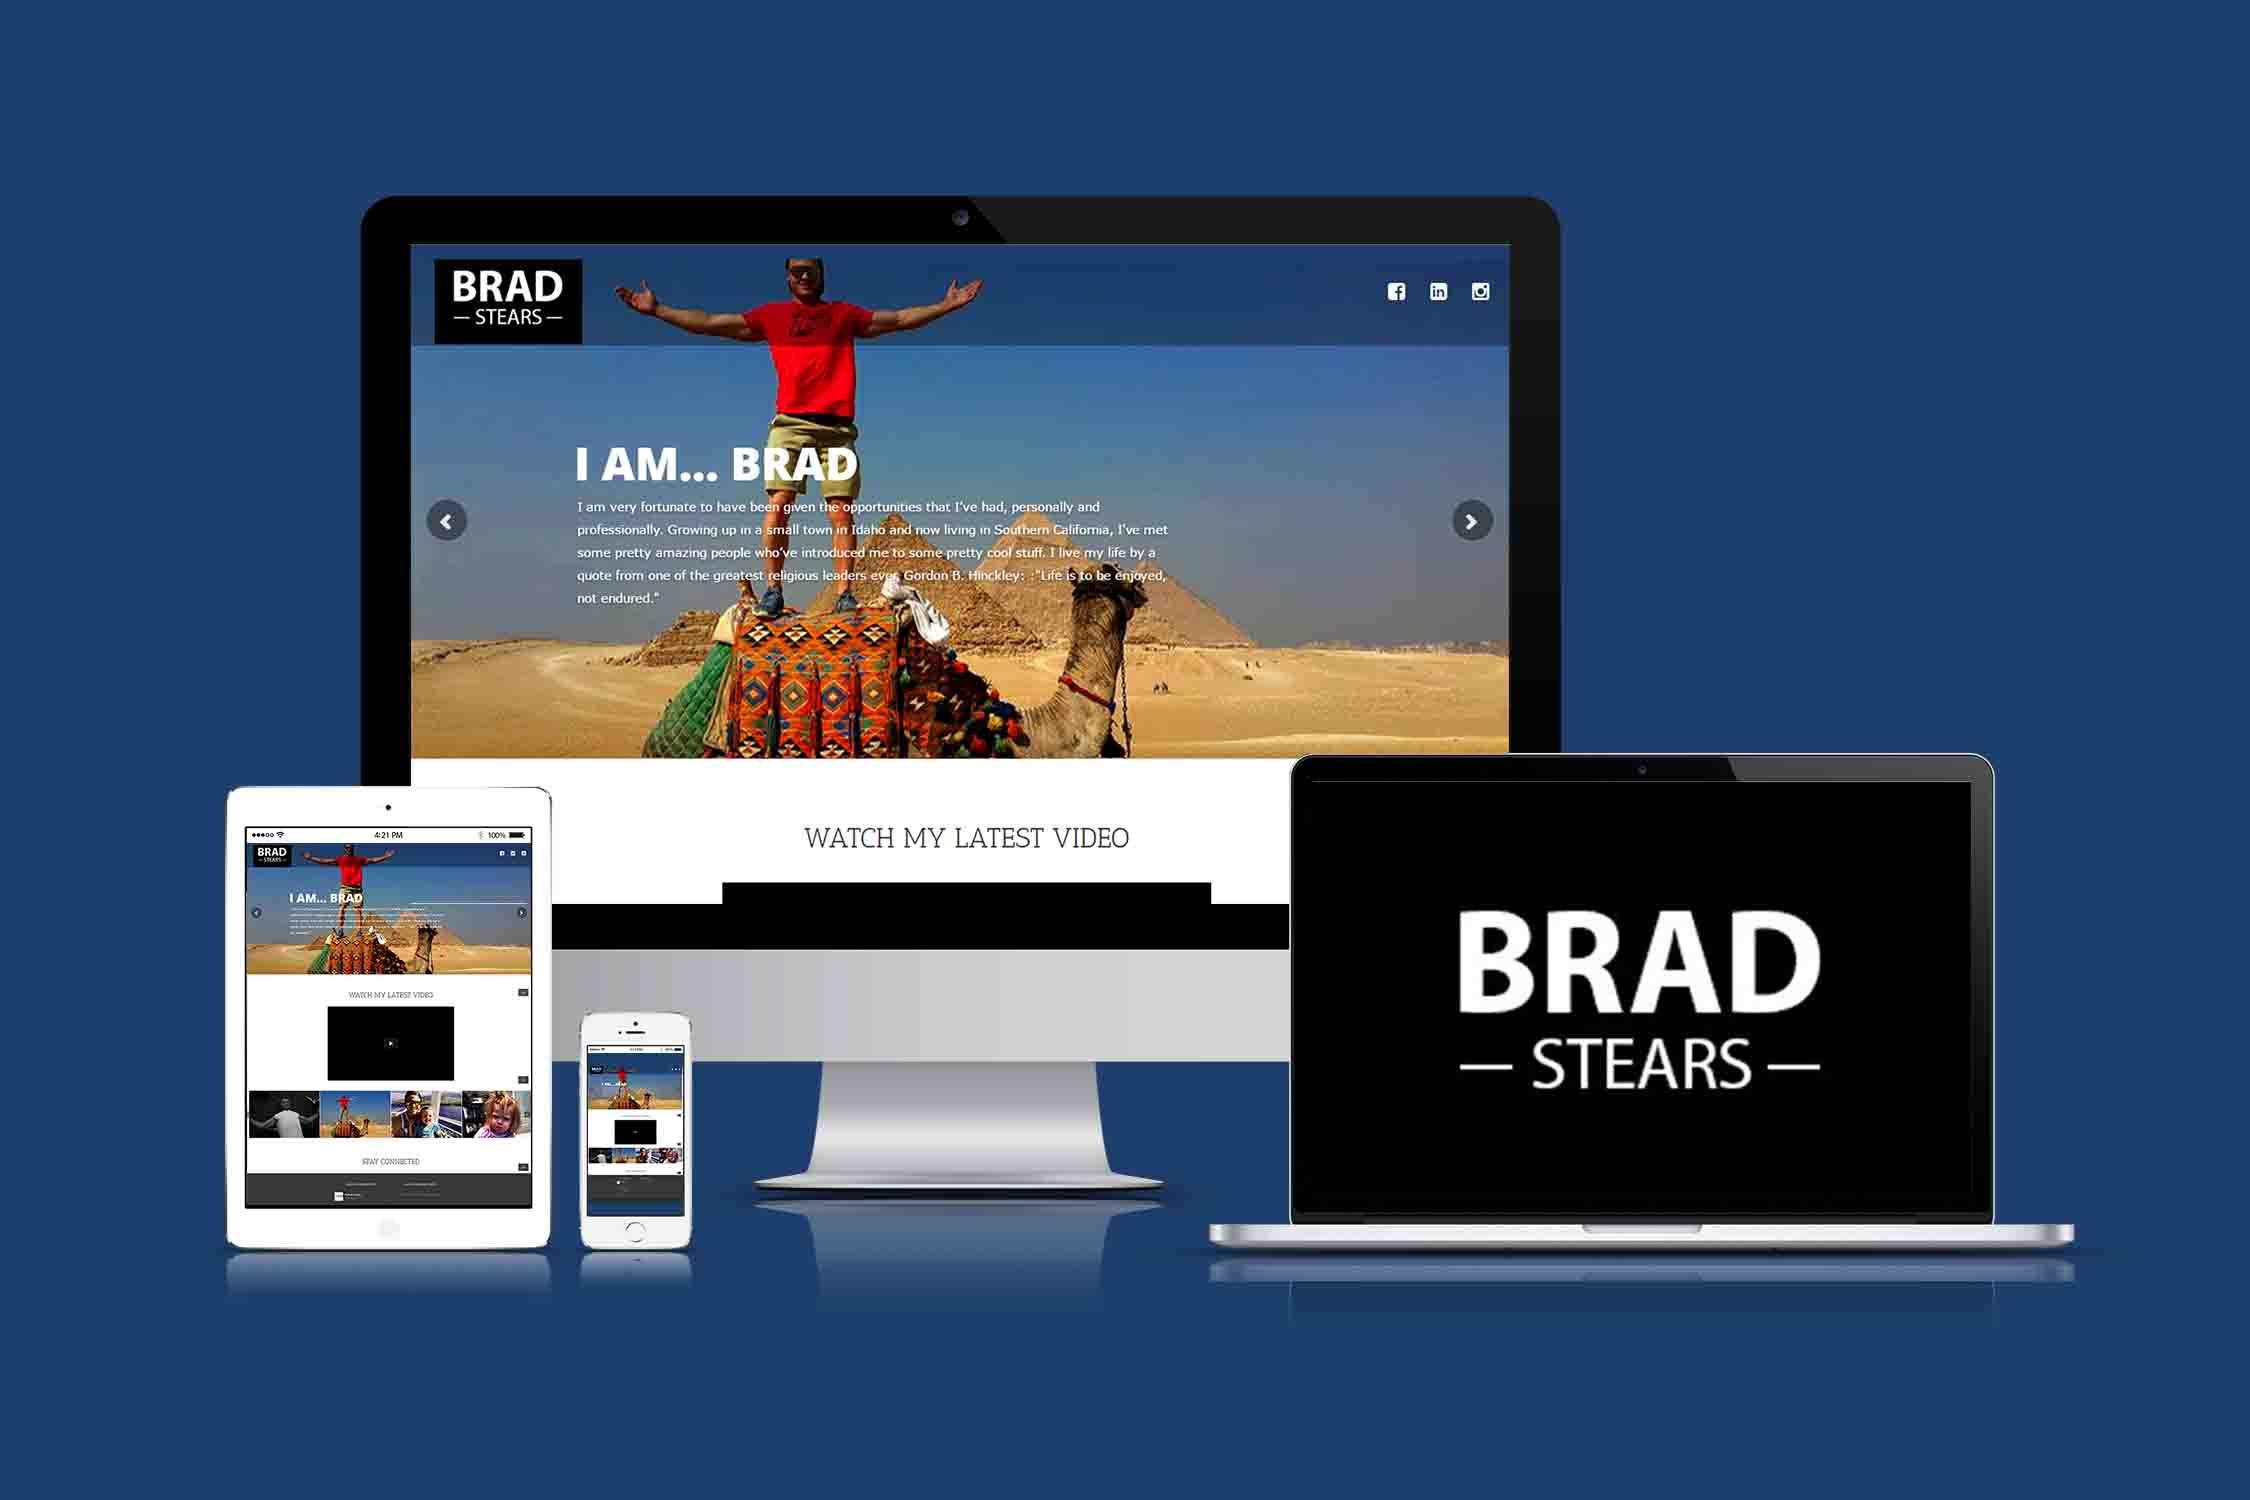 Brad Stears